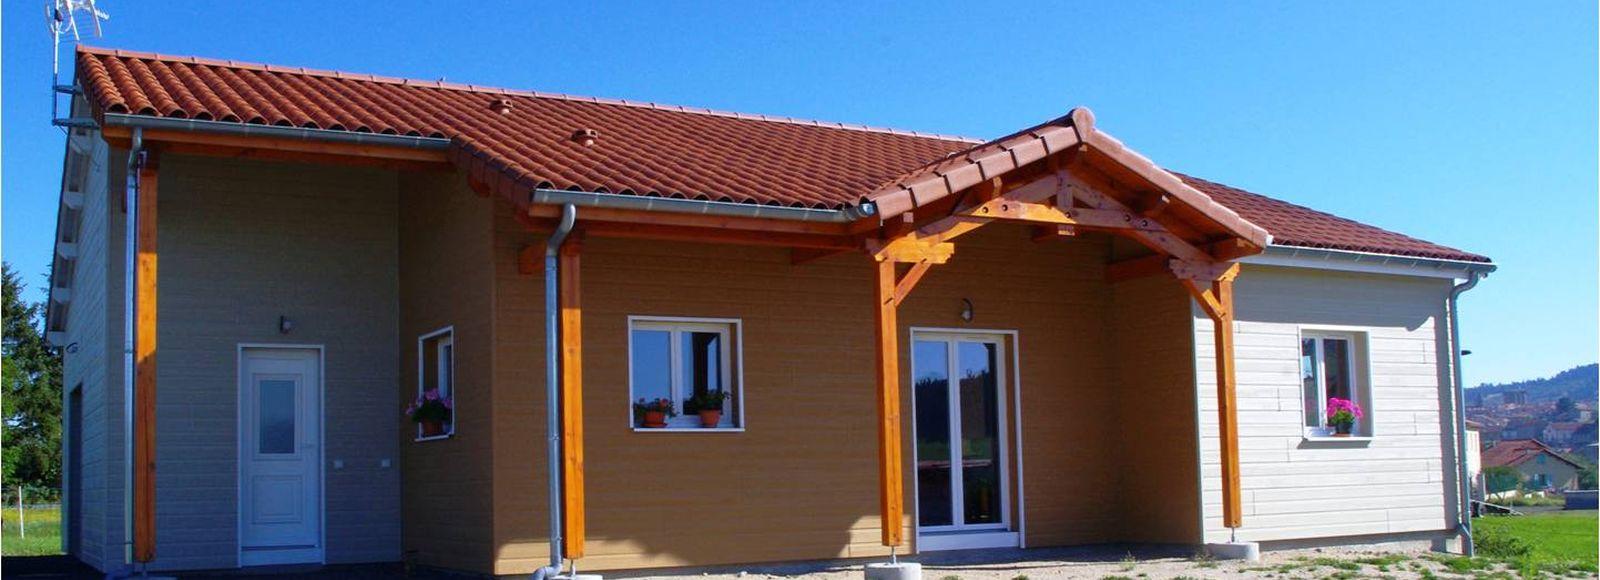 r sinence construction bois r sinence construction bois. Black Bedroom Furniture Sets. Home Design Ideas